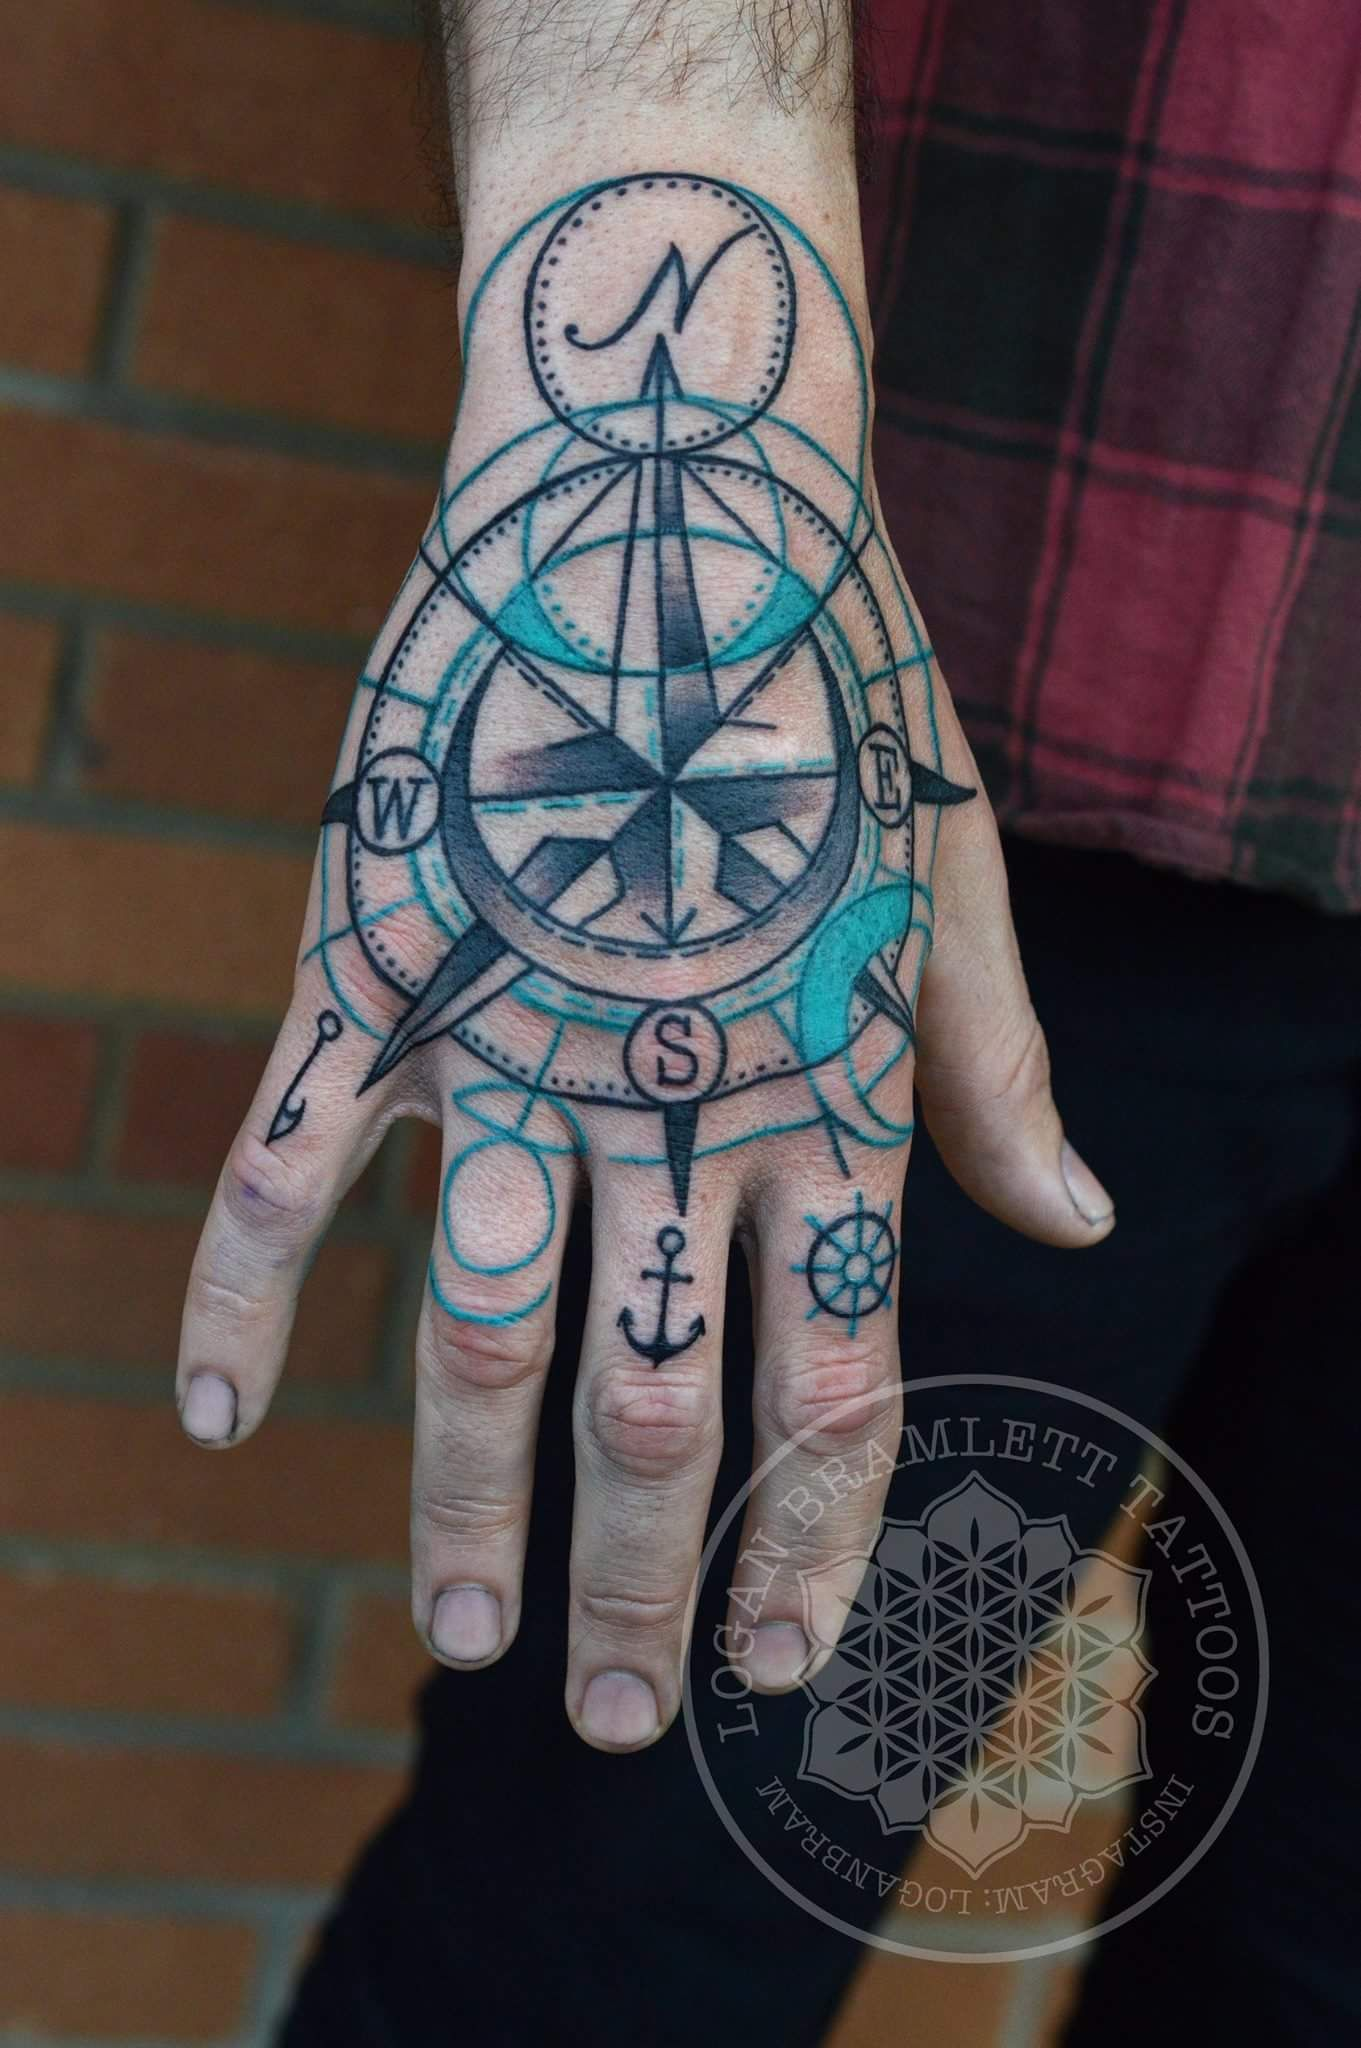 37337b2cc62b0 Abstract/stylized compass by me, Logan Bramlett Wanderlust Tattoo Society  Akron Ohio - Imgur